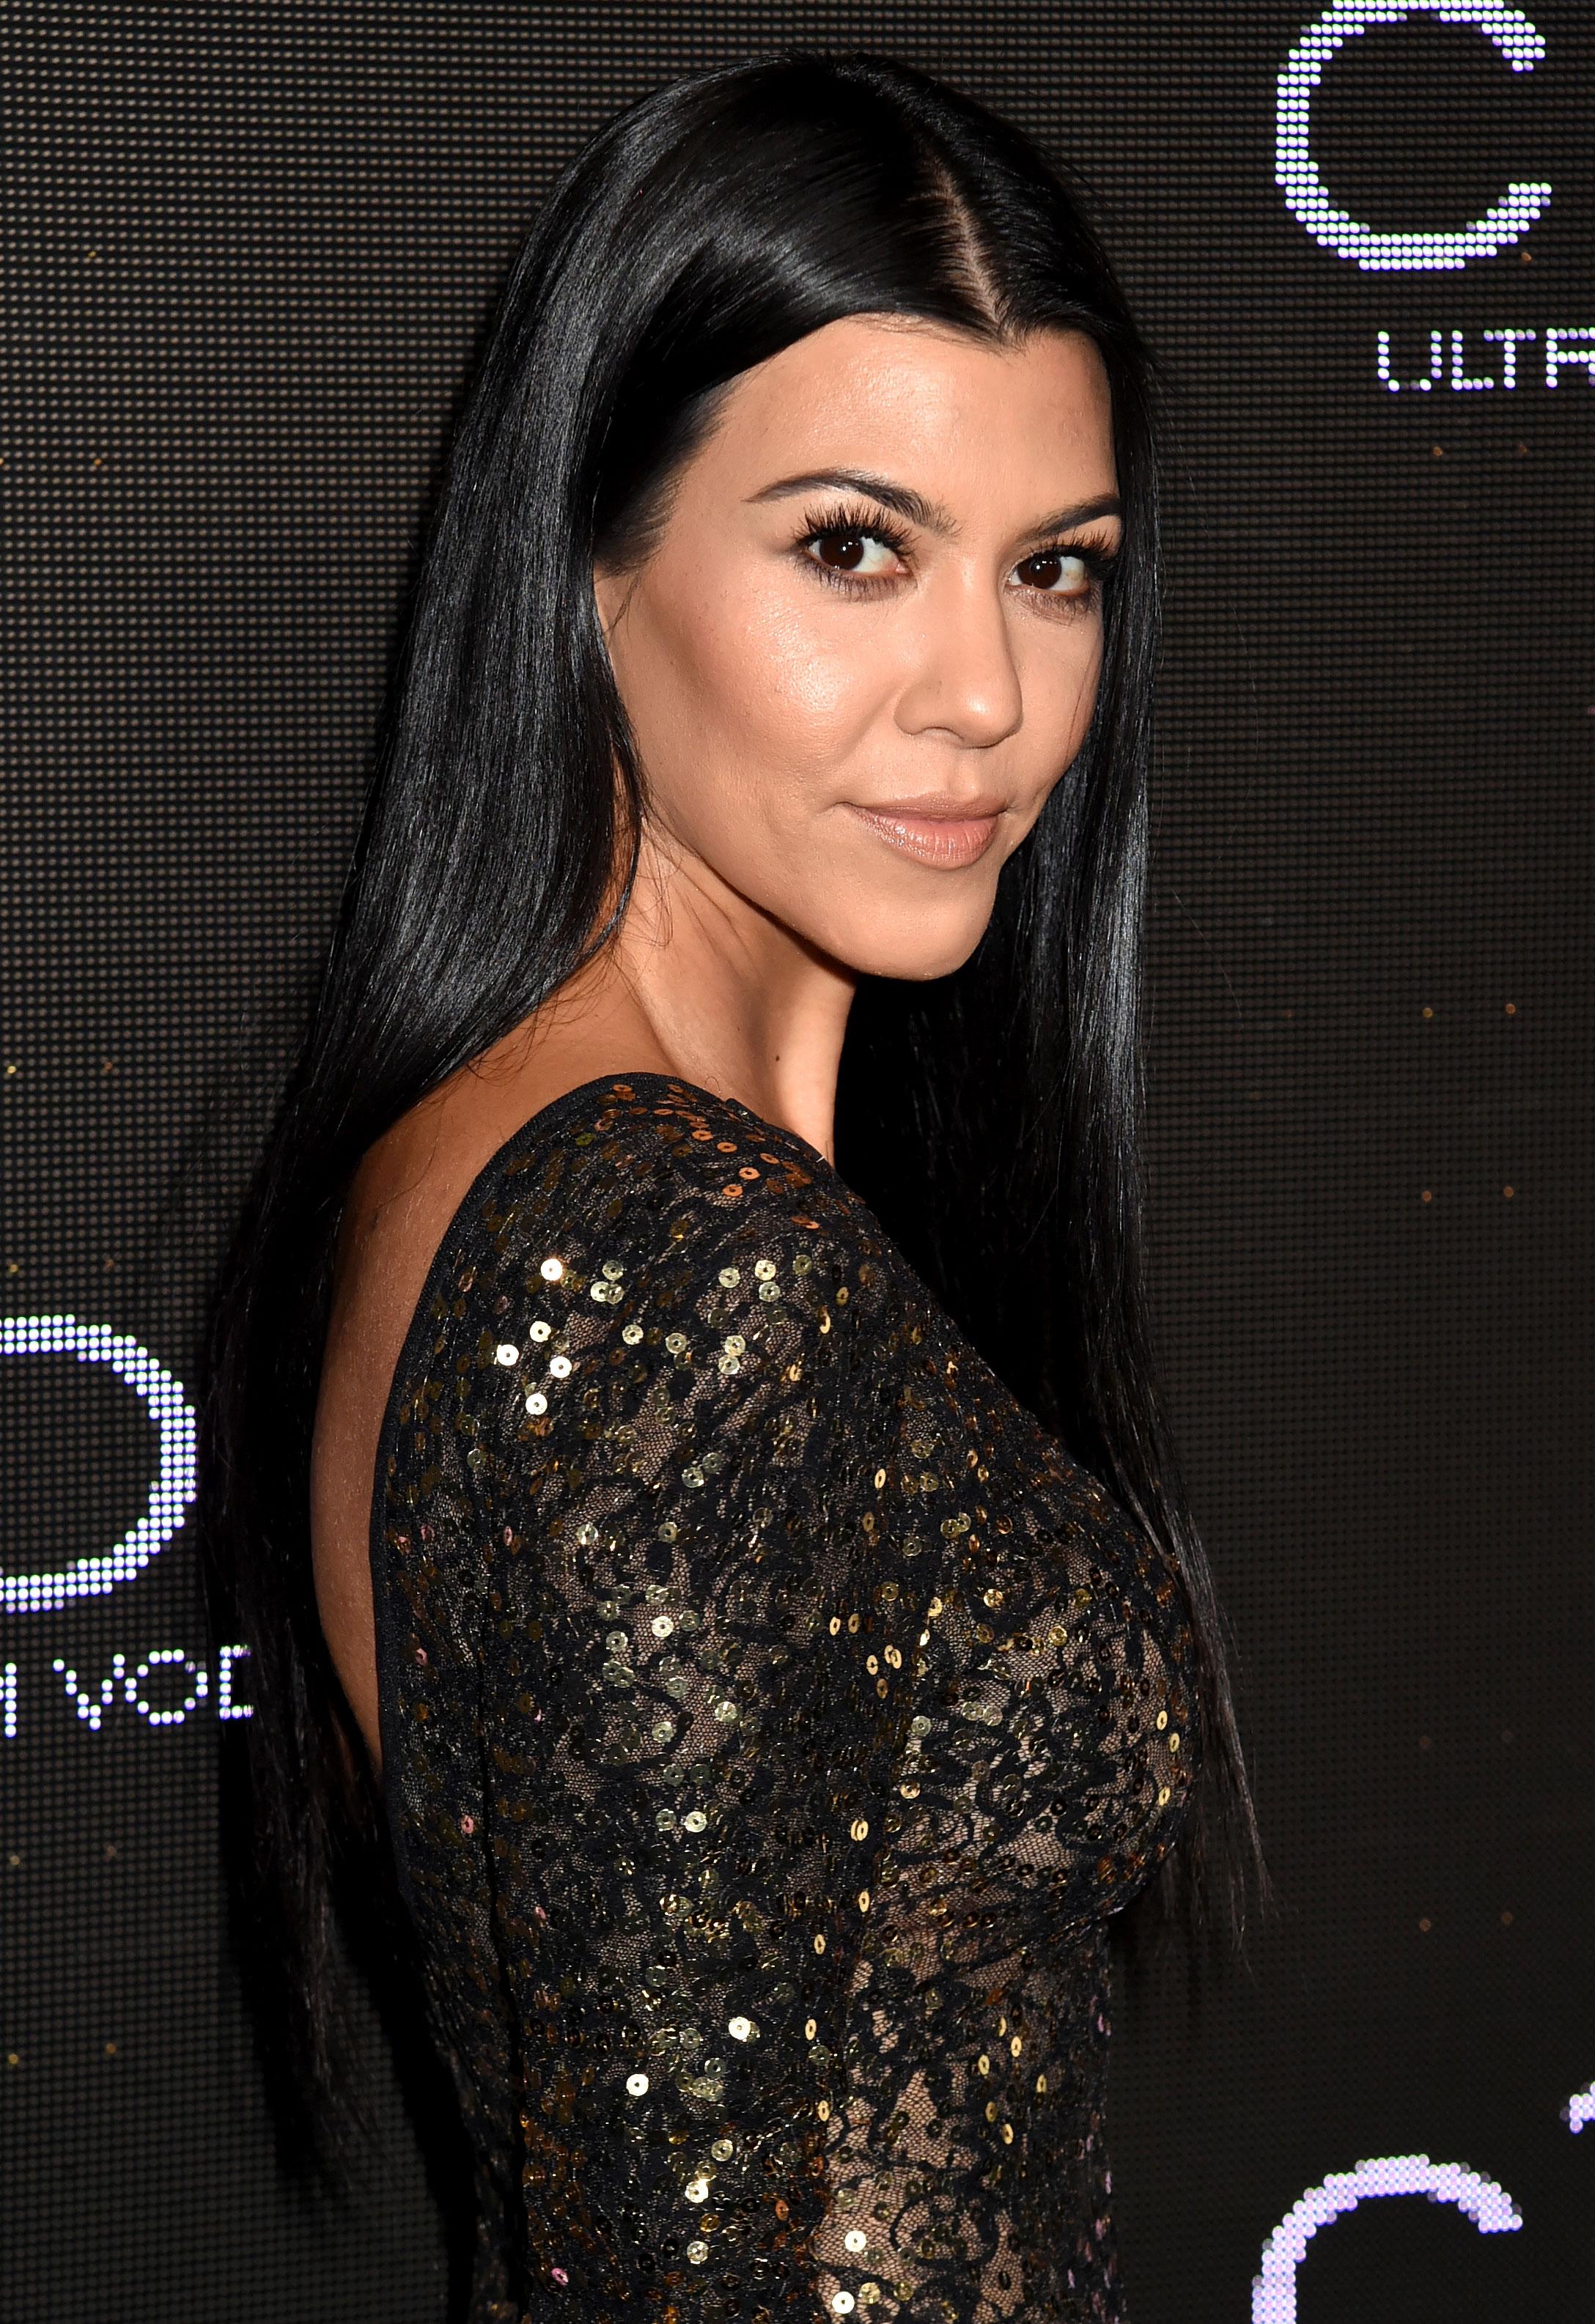 Kourtney Kardashian Through the Years - Following her split from Disick, Kourtney was briefly linked to Justin Bieber.